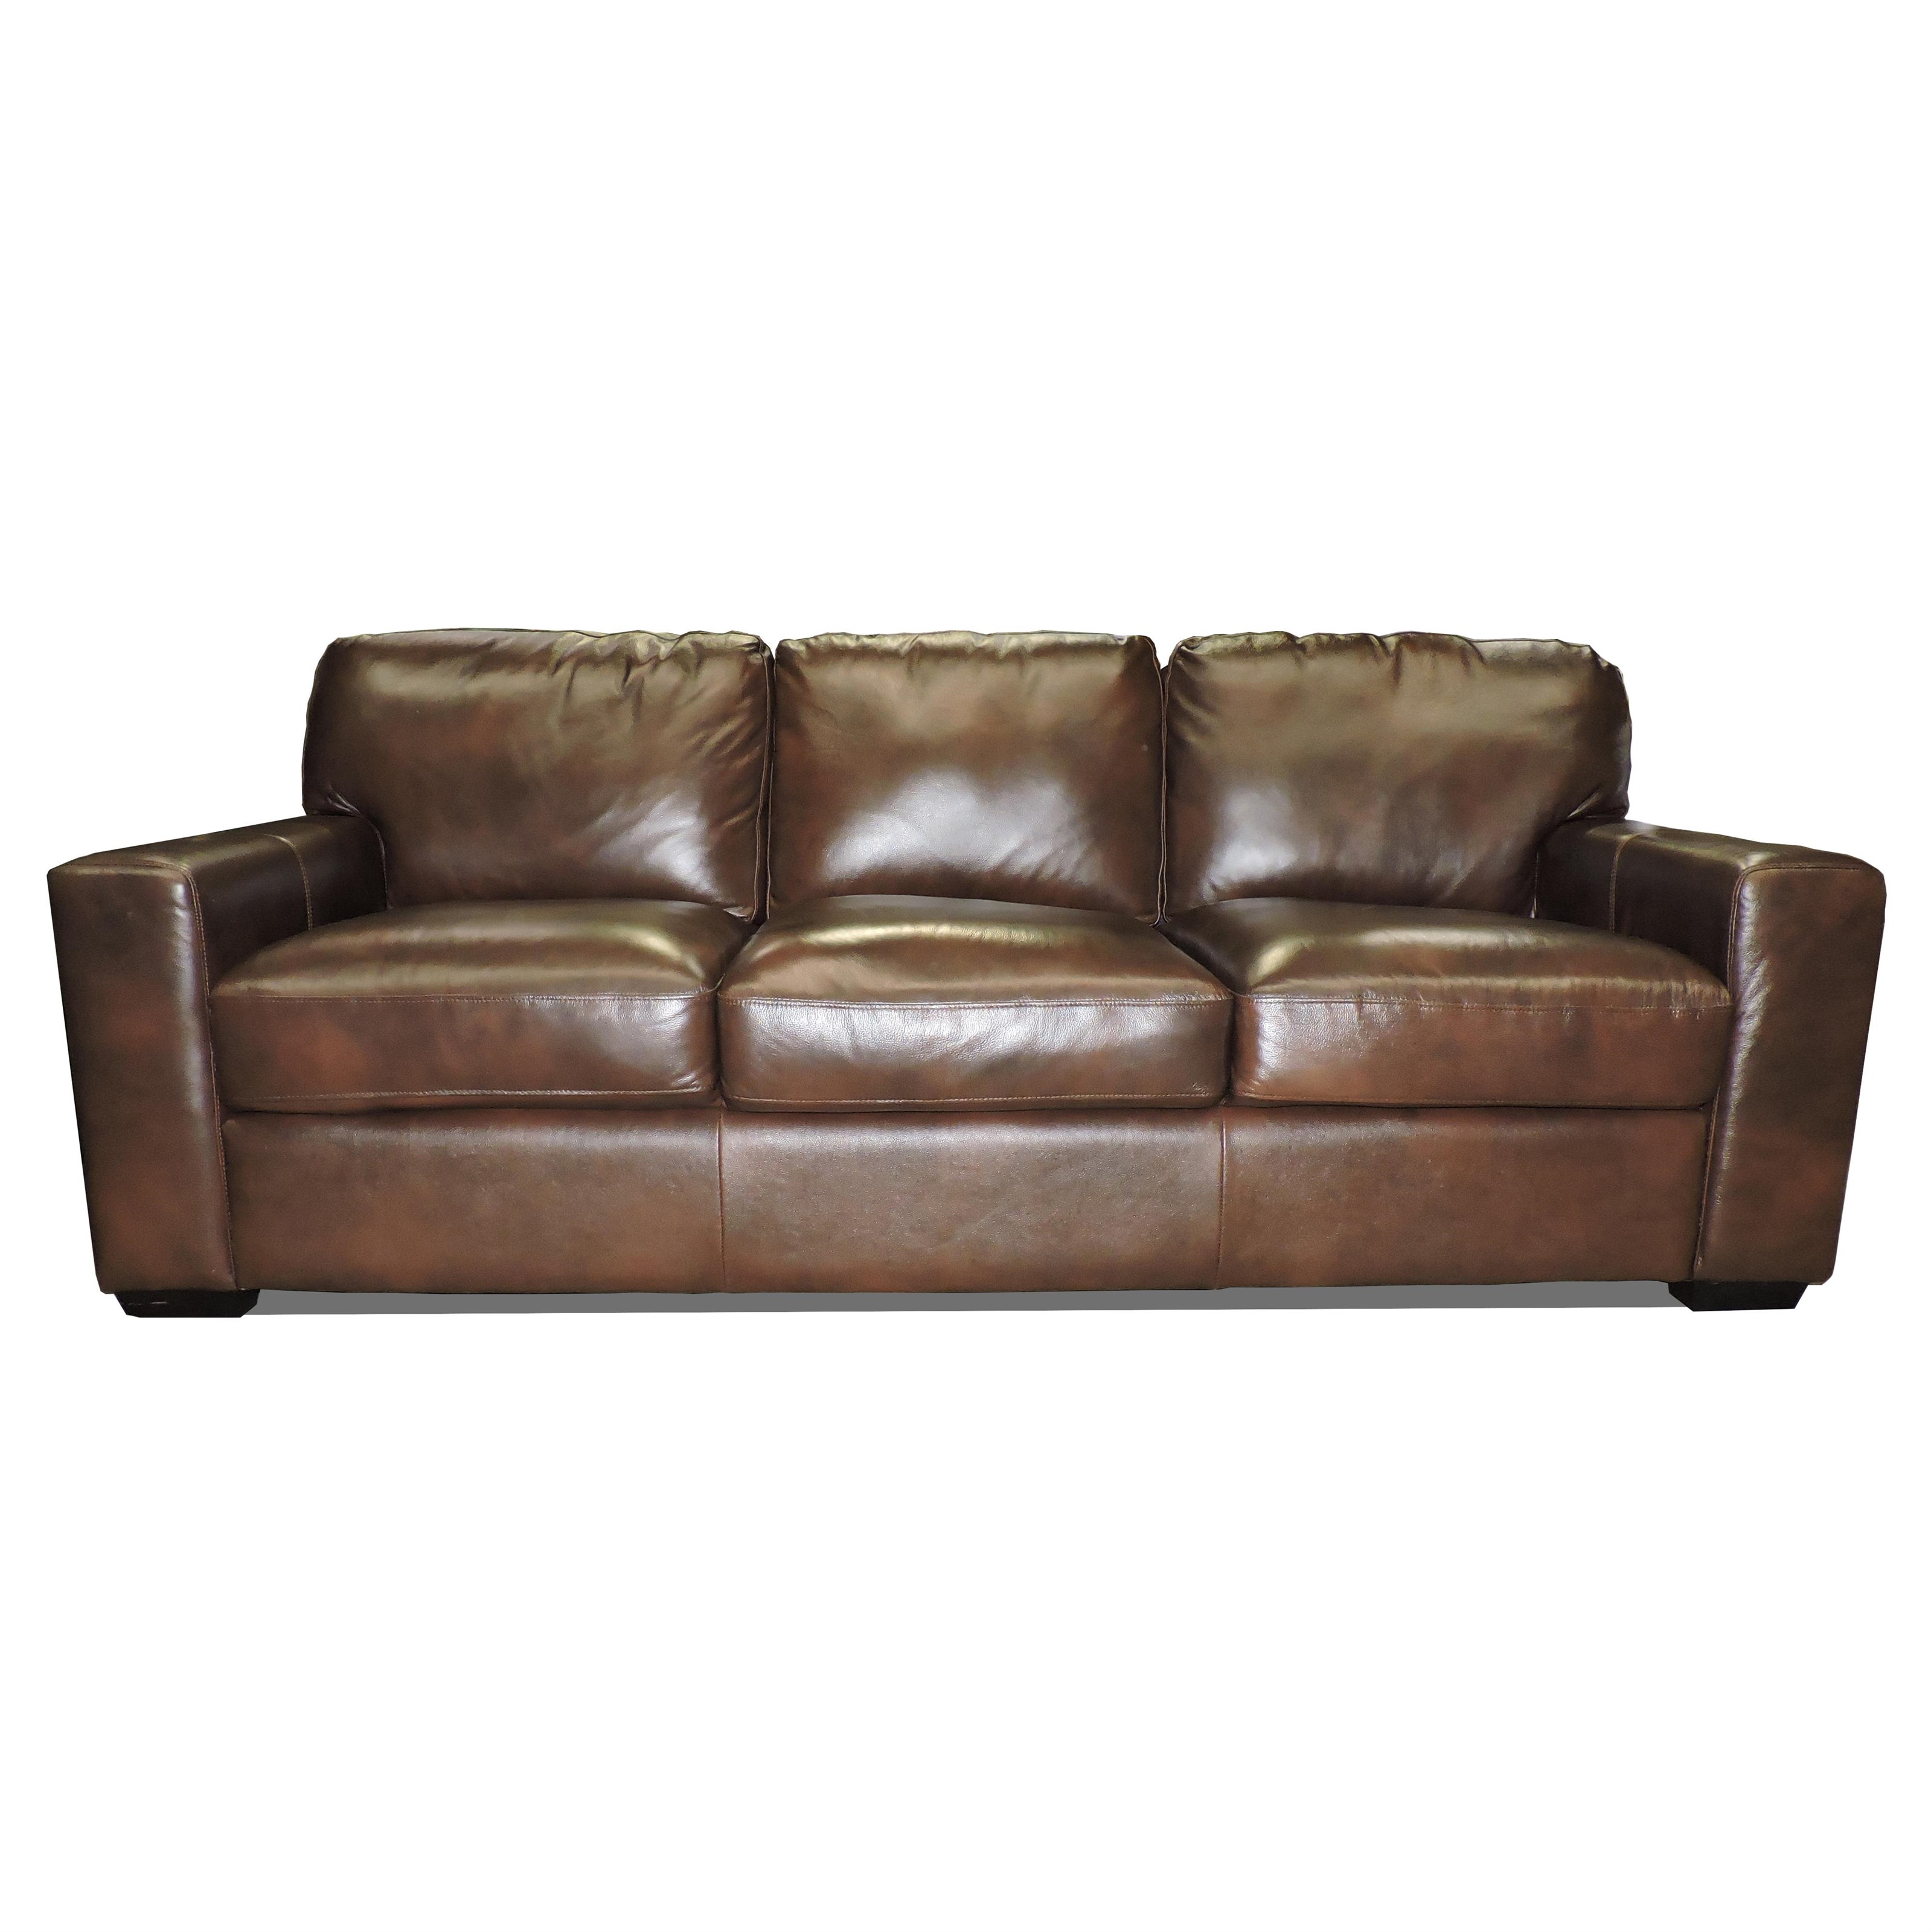 Natuzzi Leather Sofas Tampa Korea Furniture Usa 100 Raymour And Flanigan Leather Sofa Raymour